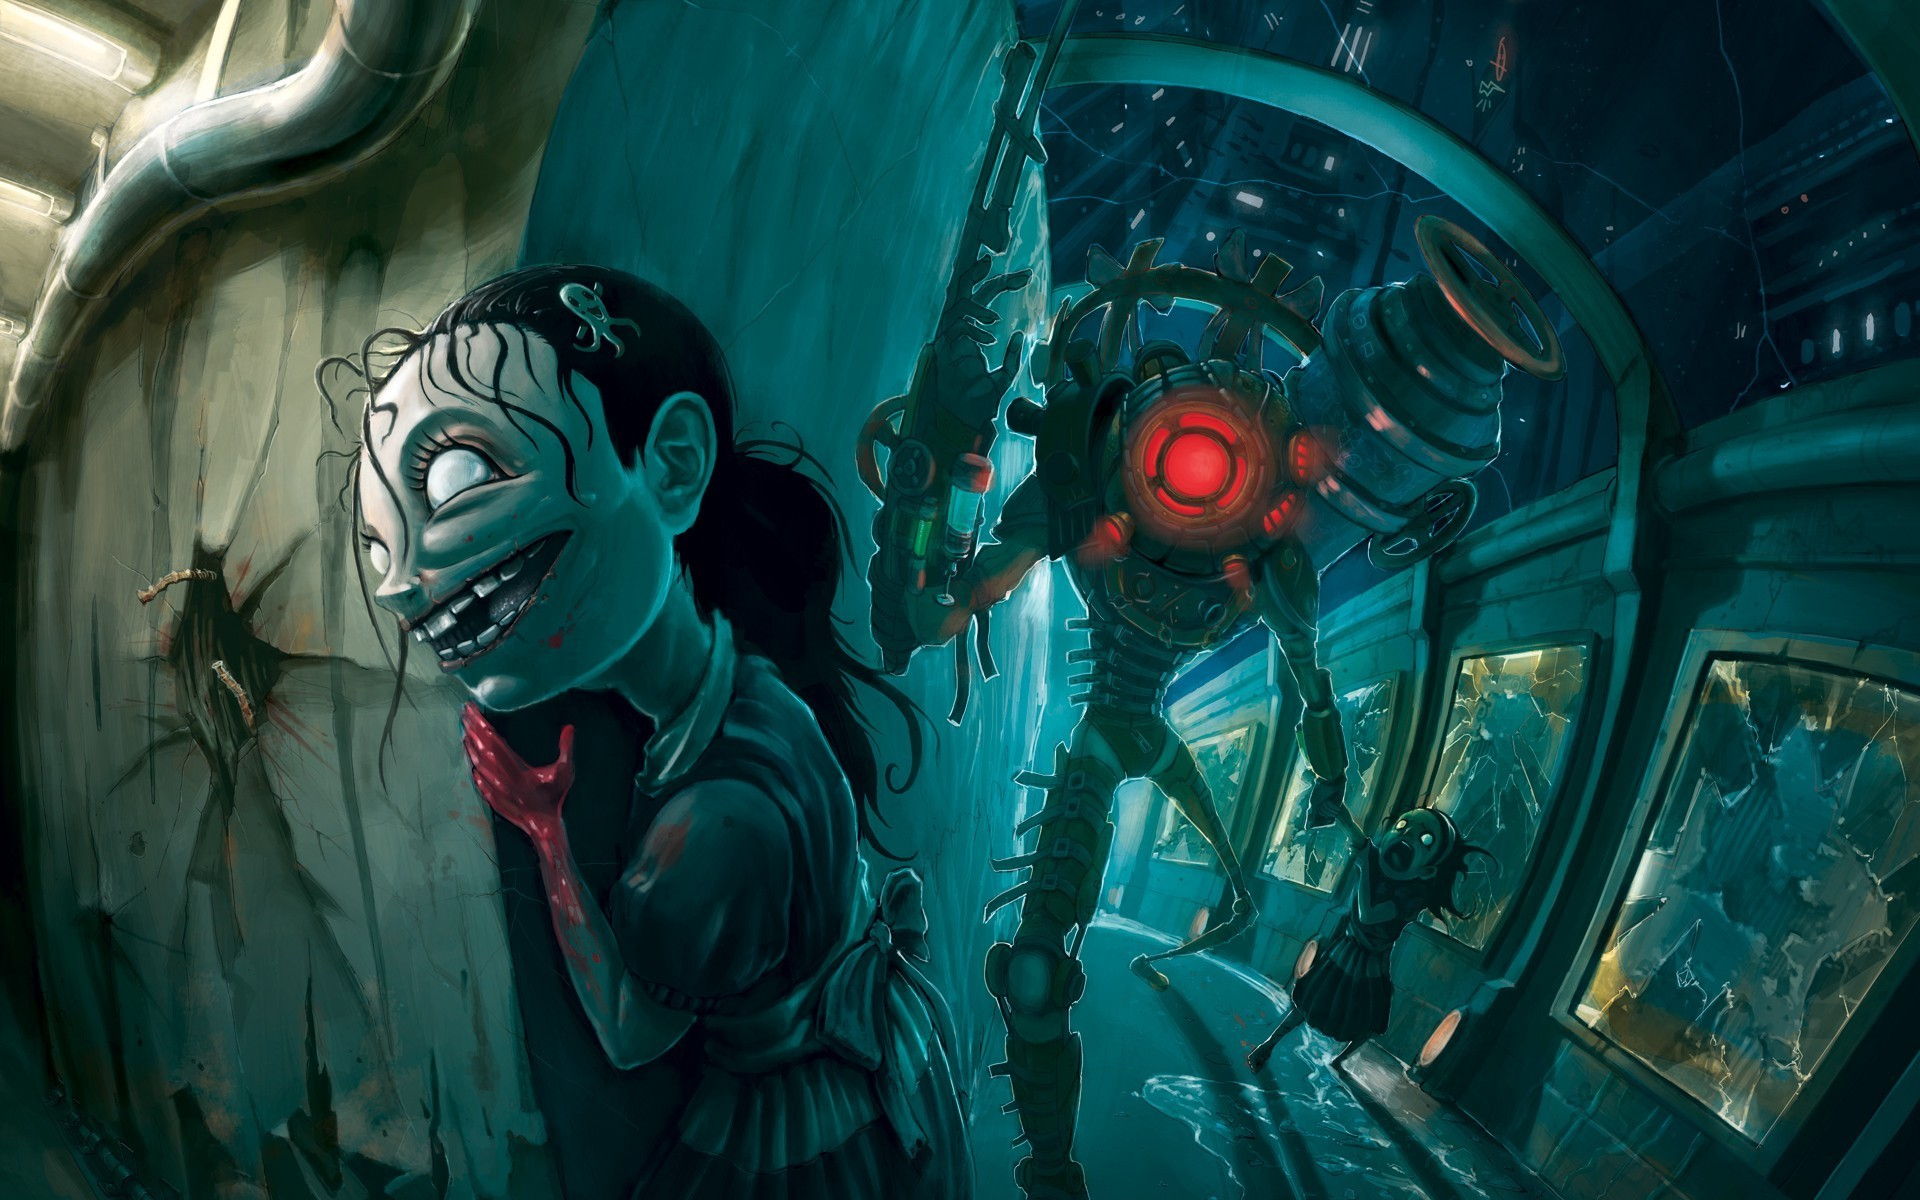 BioShock, Little Sister, Video Games, Rapture, BioShock 2 Wallpapers HD /  Desktop and Mobile Backgrounds